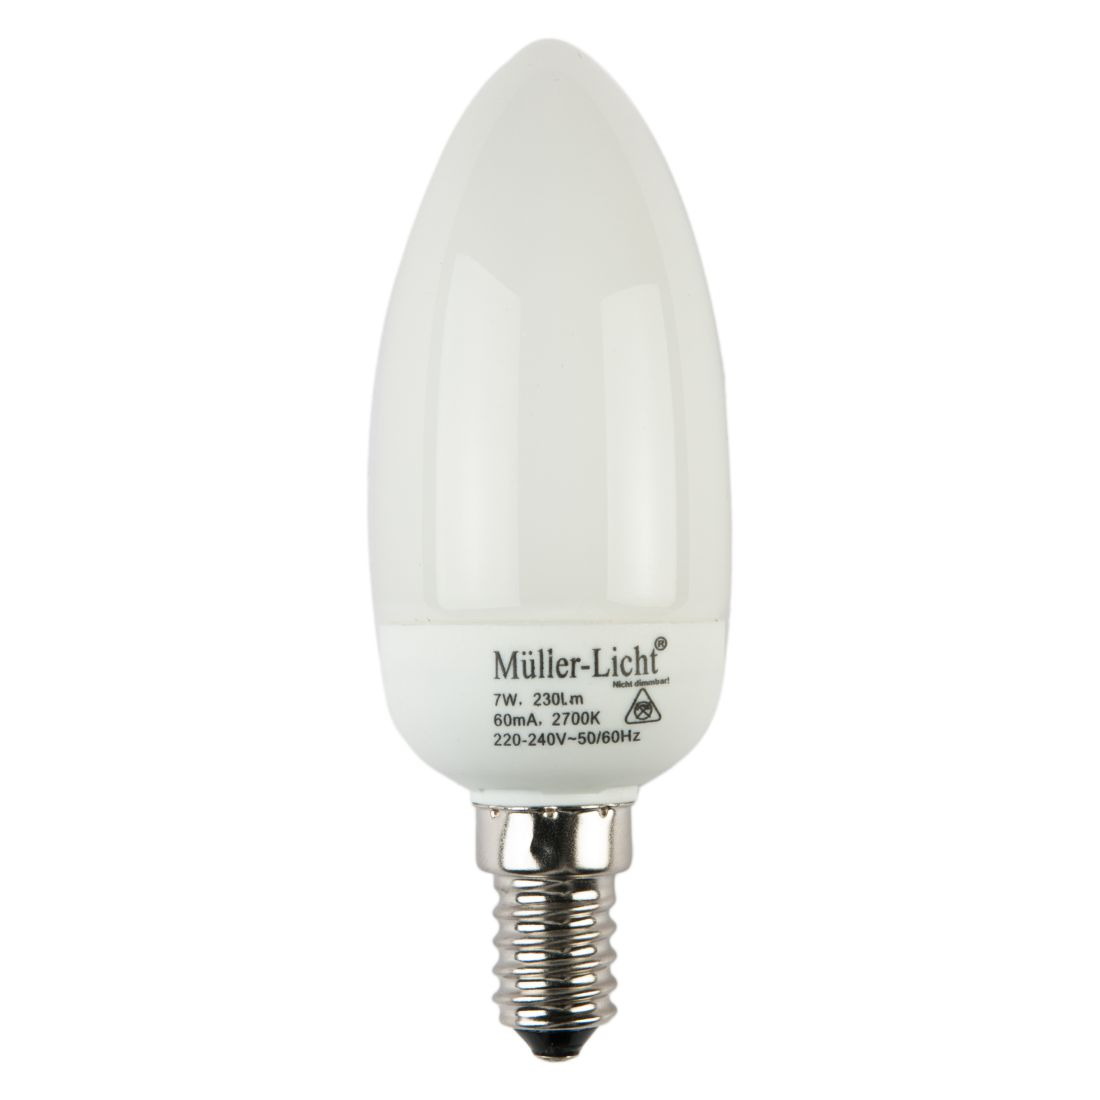 Energiesparlampe E14 7 W Kerze ● Satinglas Opalweiß- Mega Licht